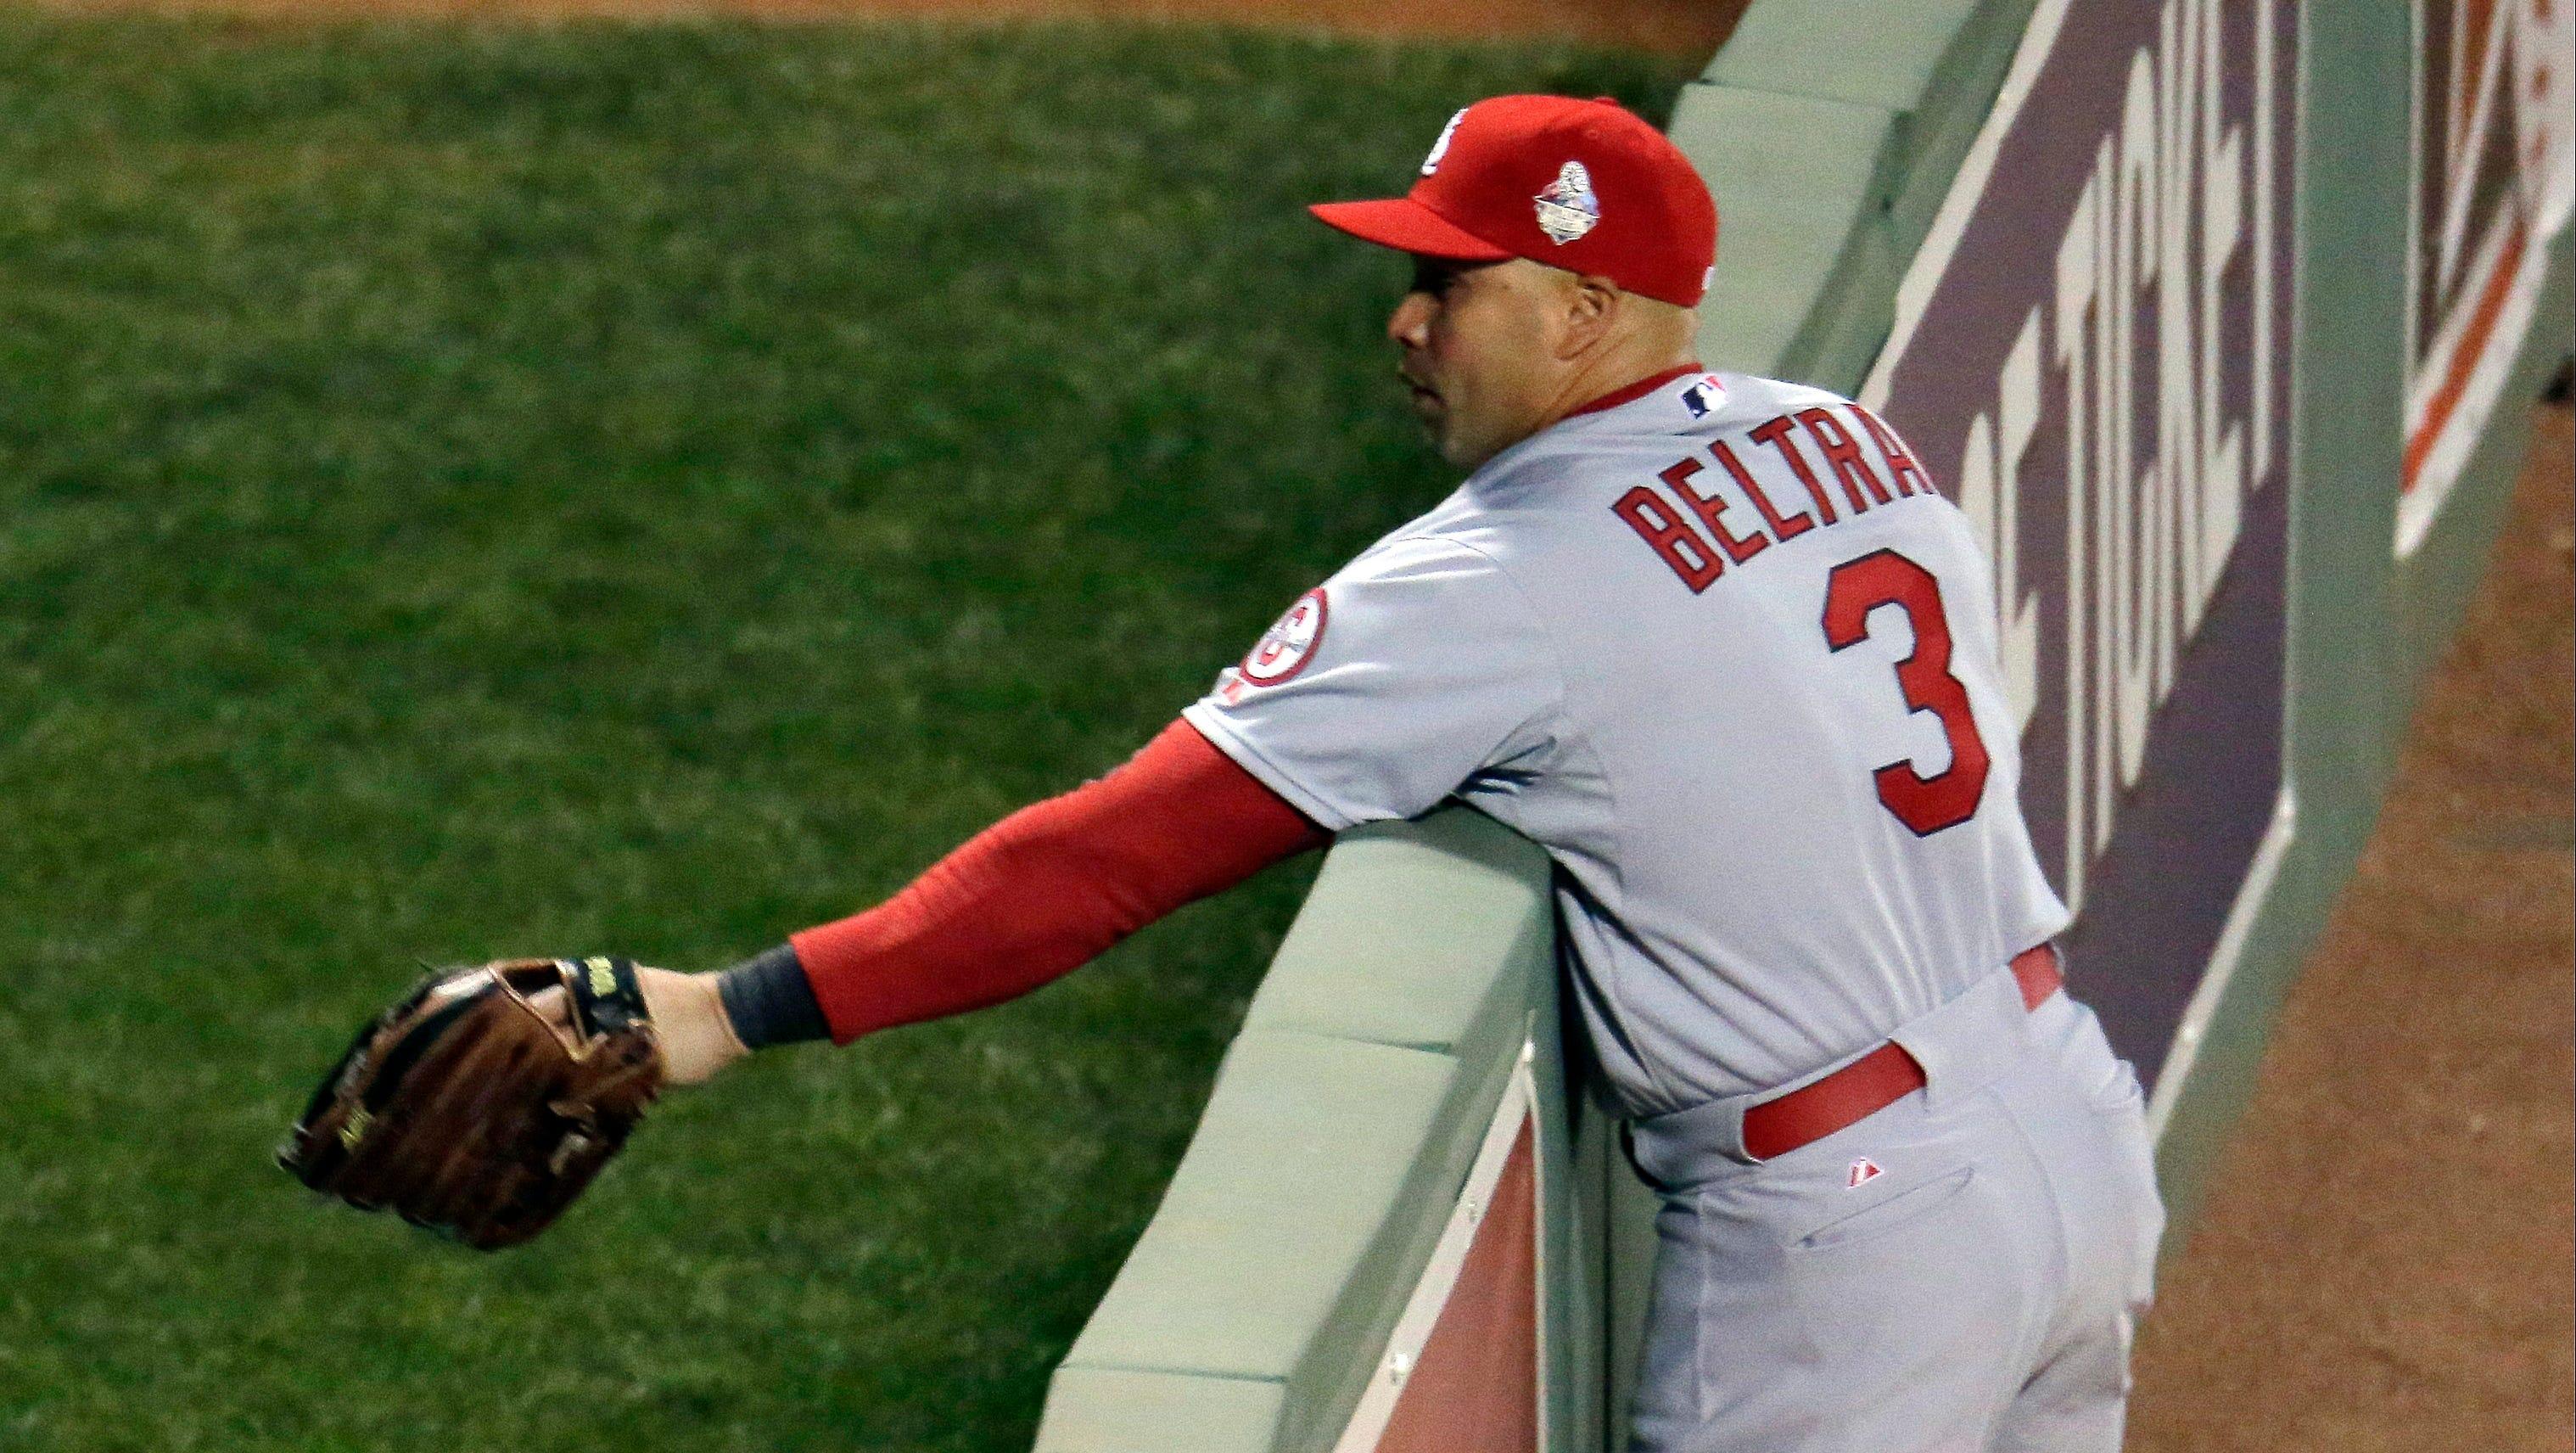 Beltran S World Series Debut Cut Short With Injury